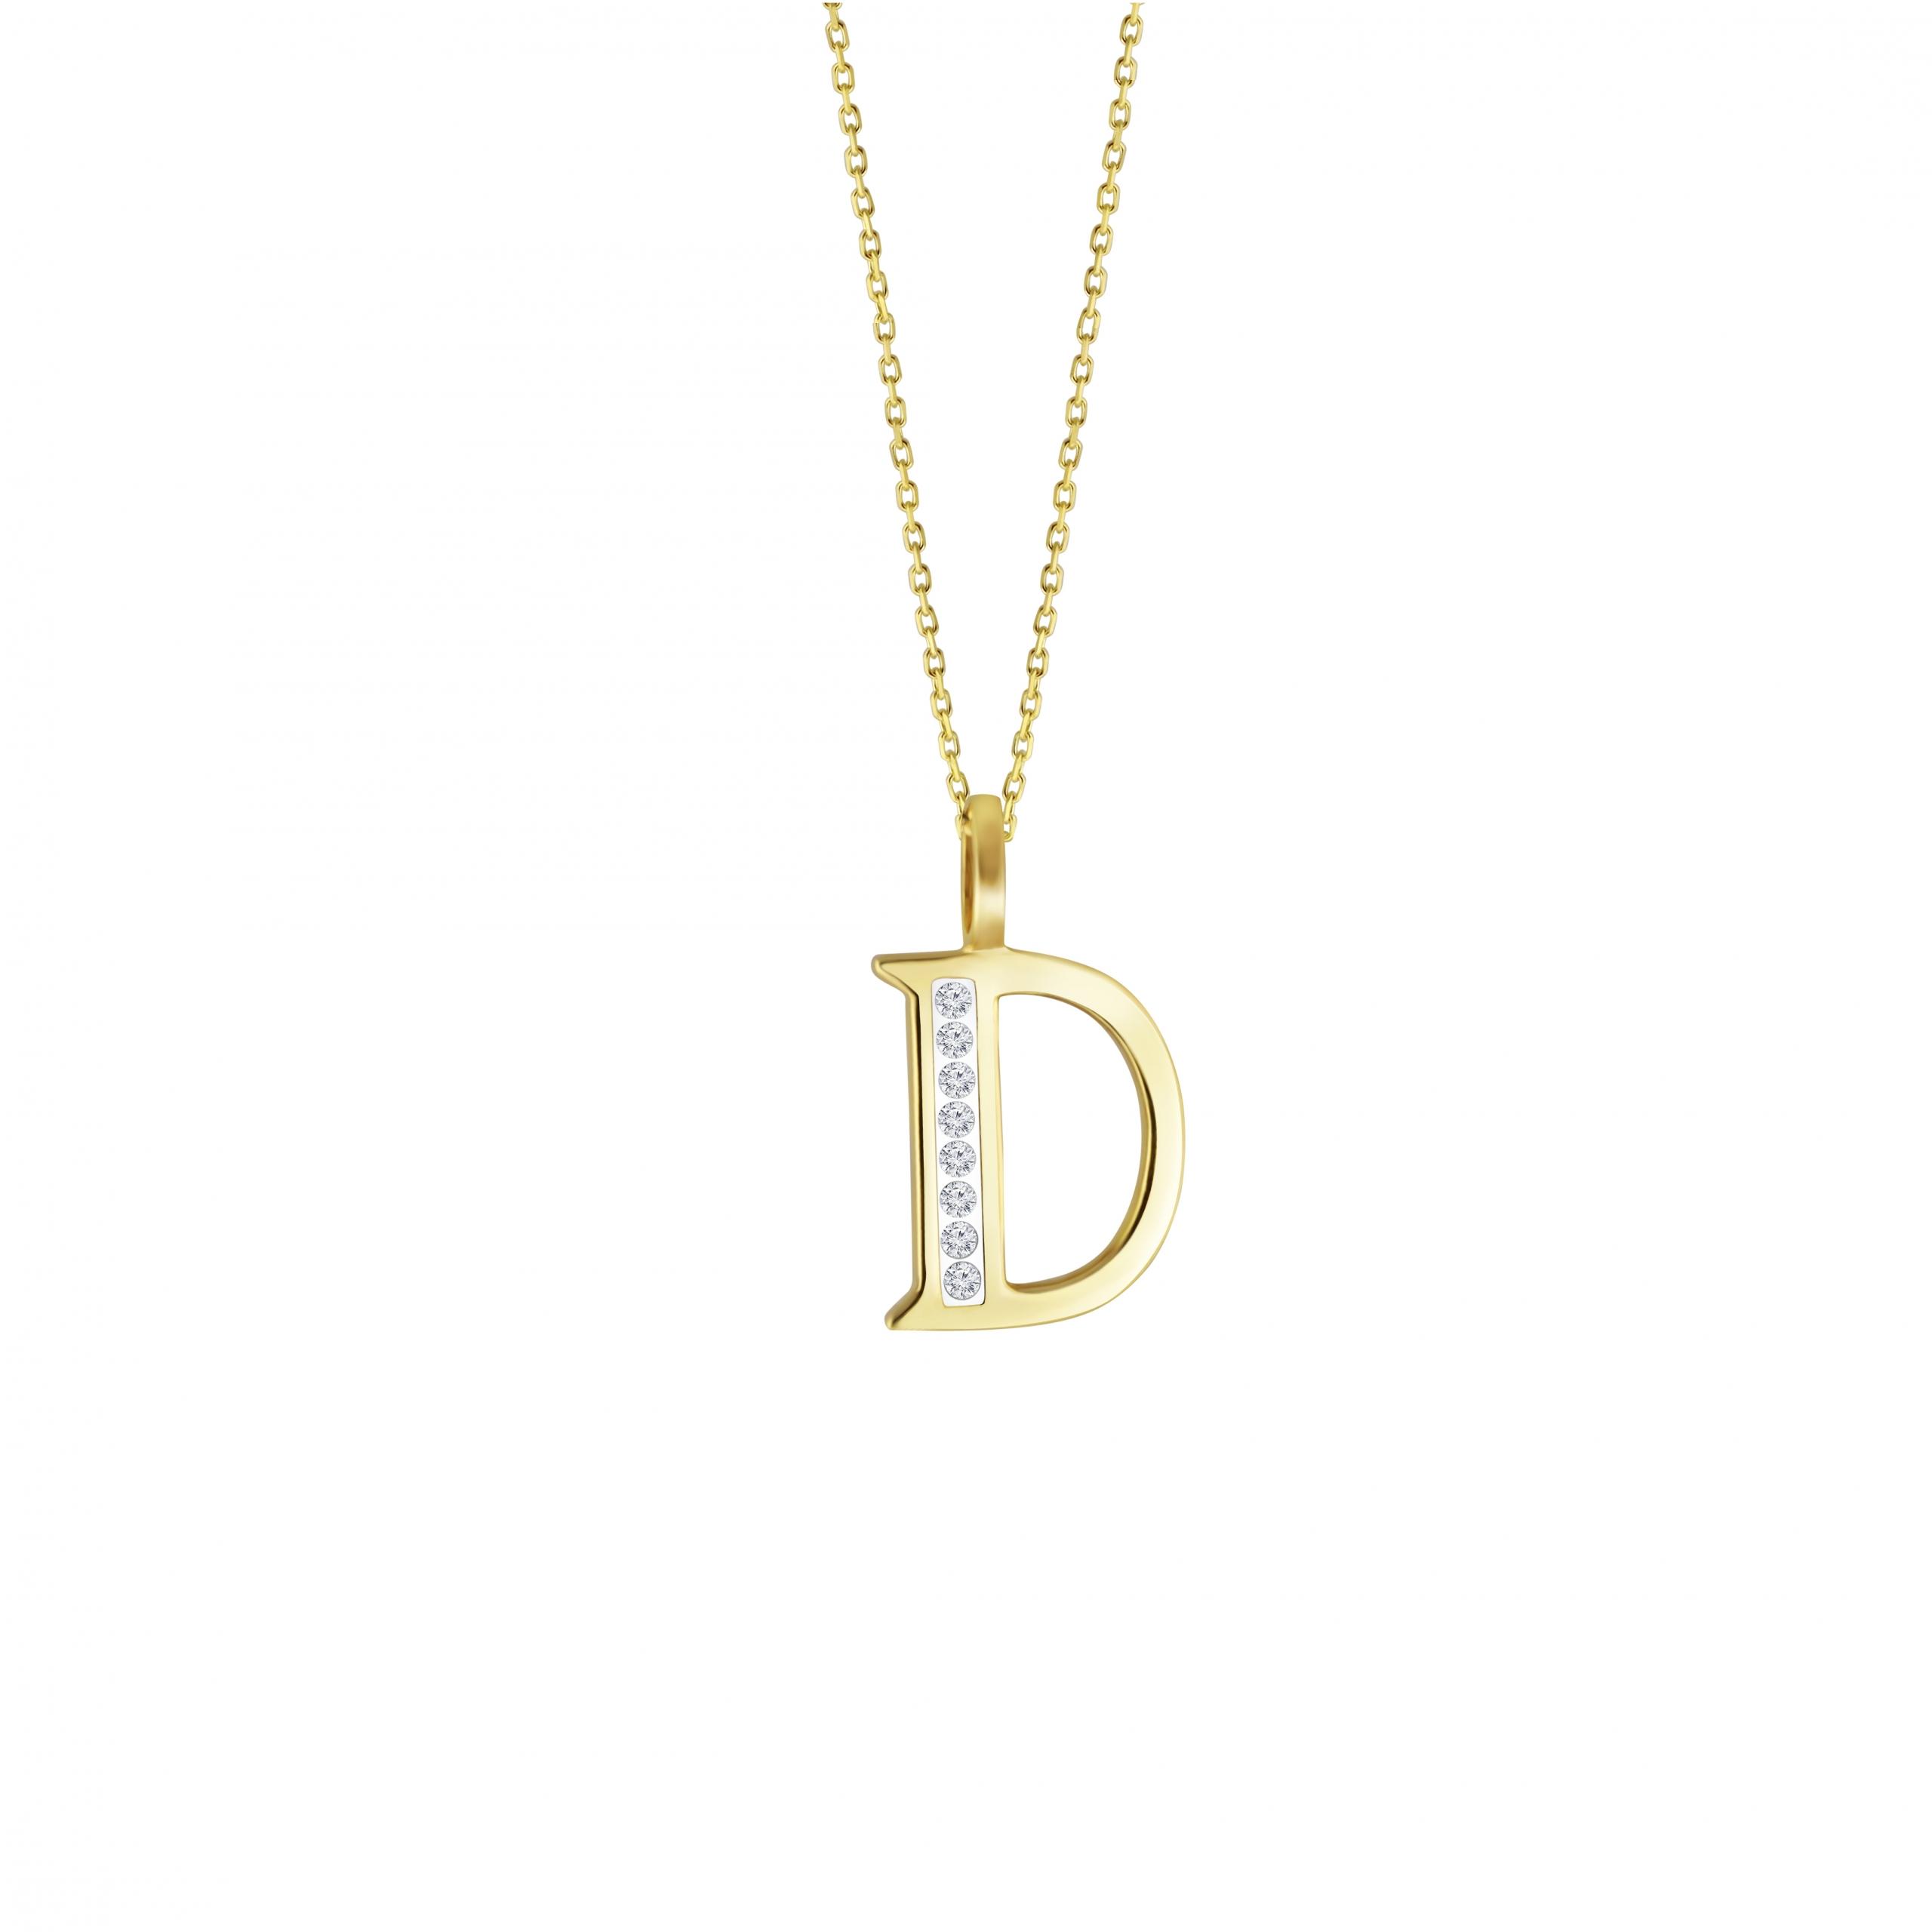 D' Alphabet Pendant chain with Diamonds